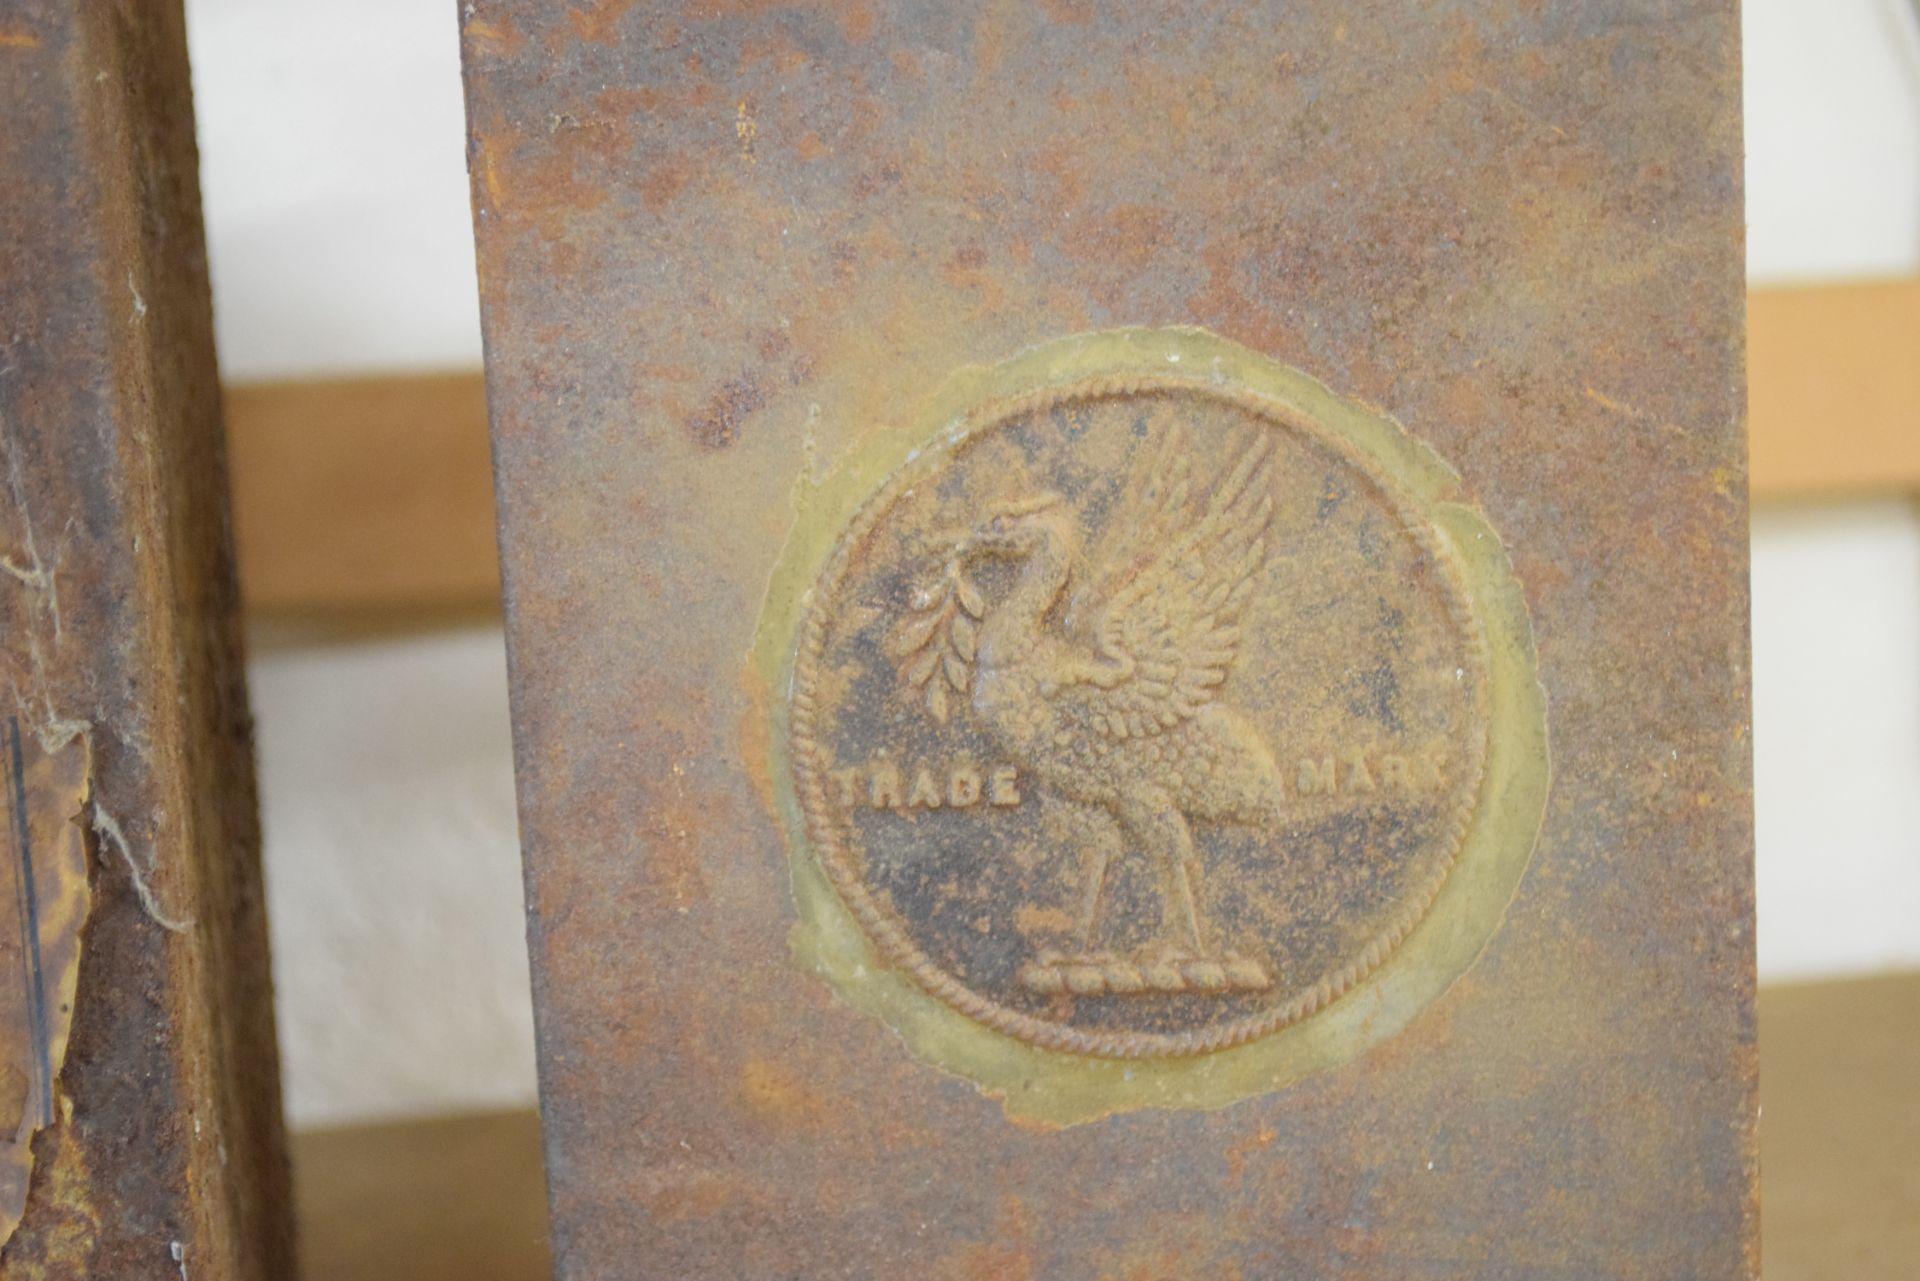 Three vintage Goodlass Wall & Co Ltd Liverpool - Image 2 of 3